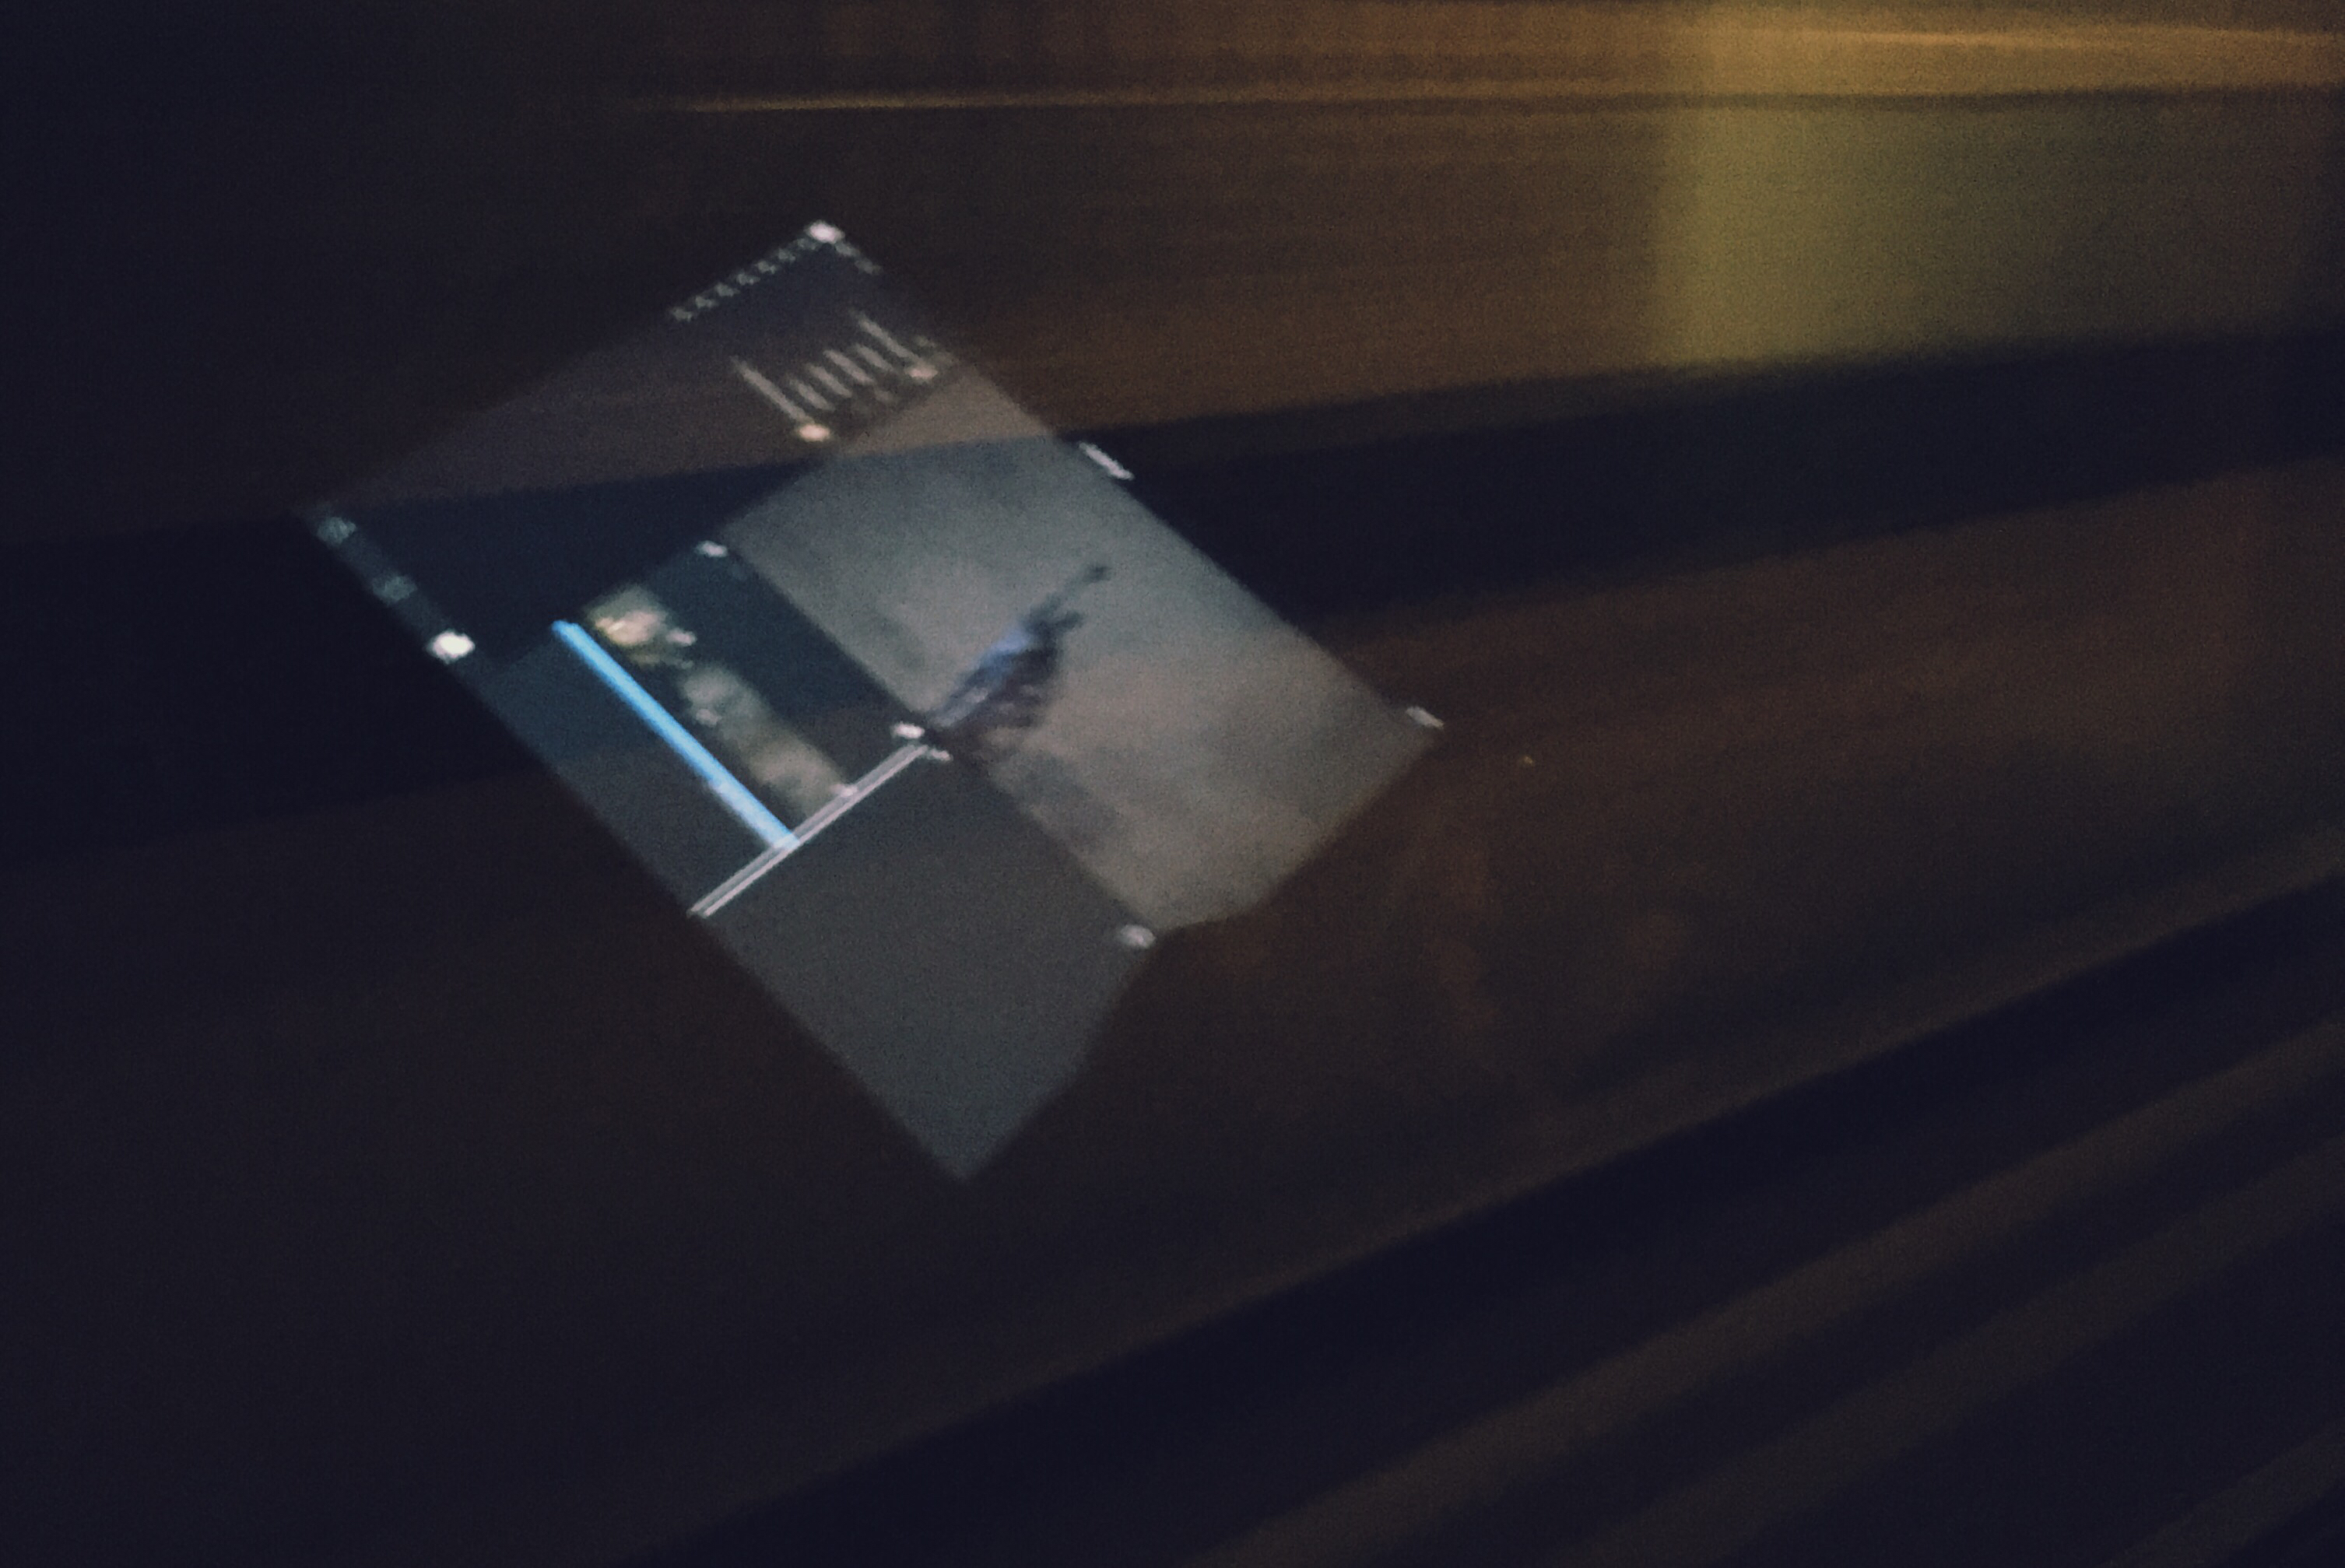 ipad pro edit in the car